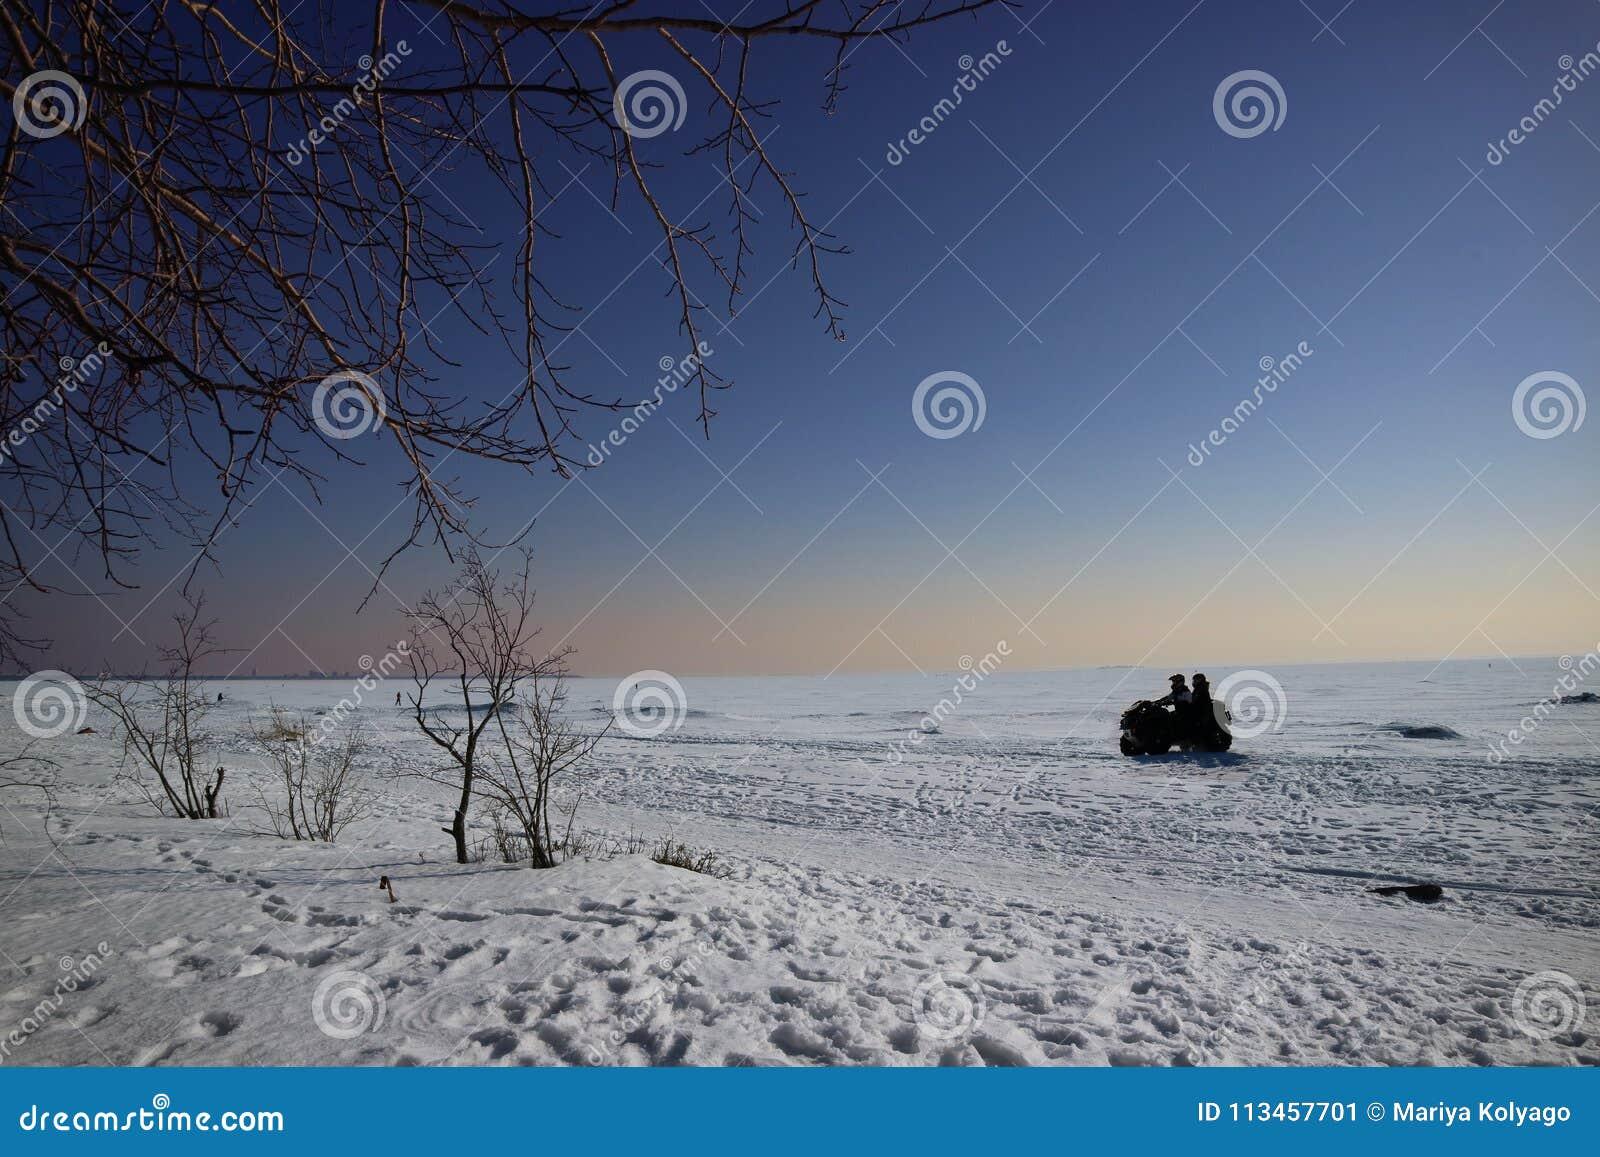 Winter trip on the ATV